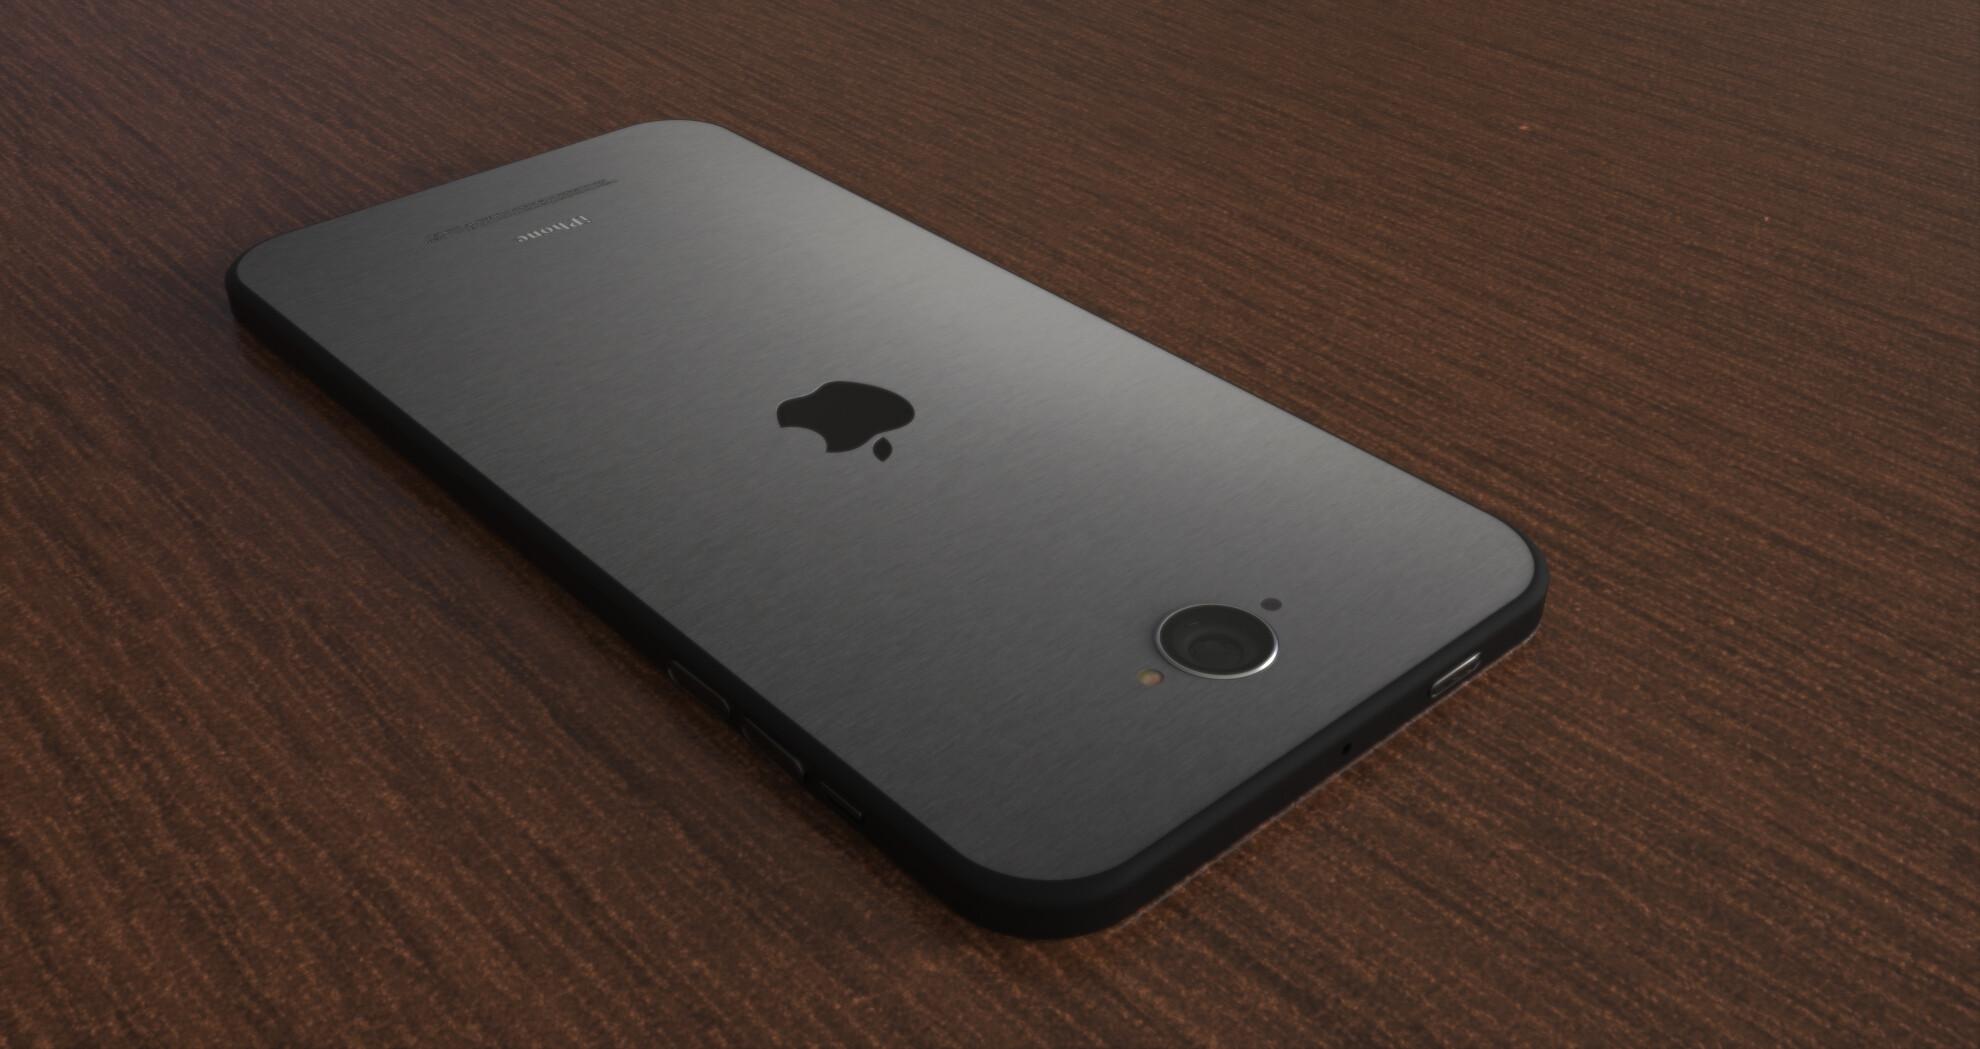 Apple Iphone 6s 7 Concept Video Imagines The New Camera Design